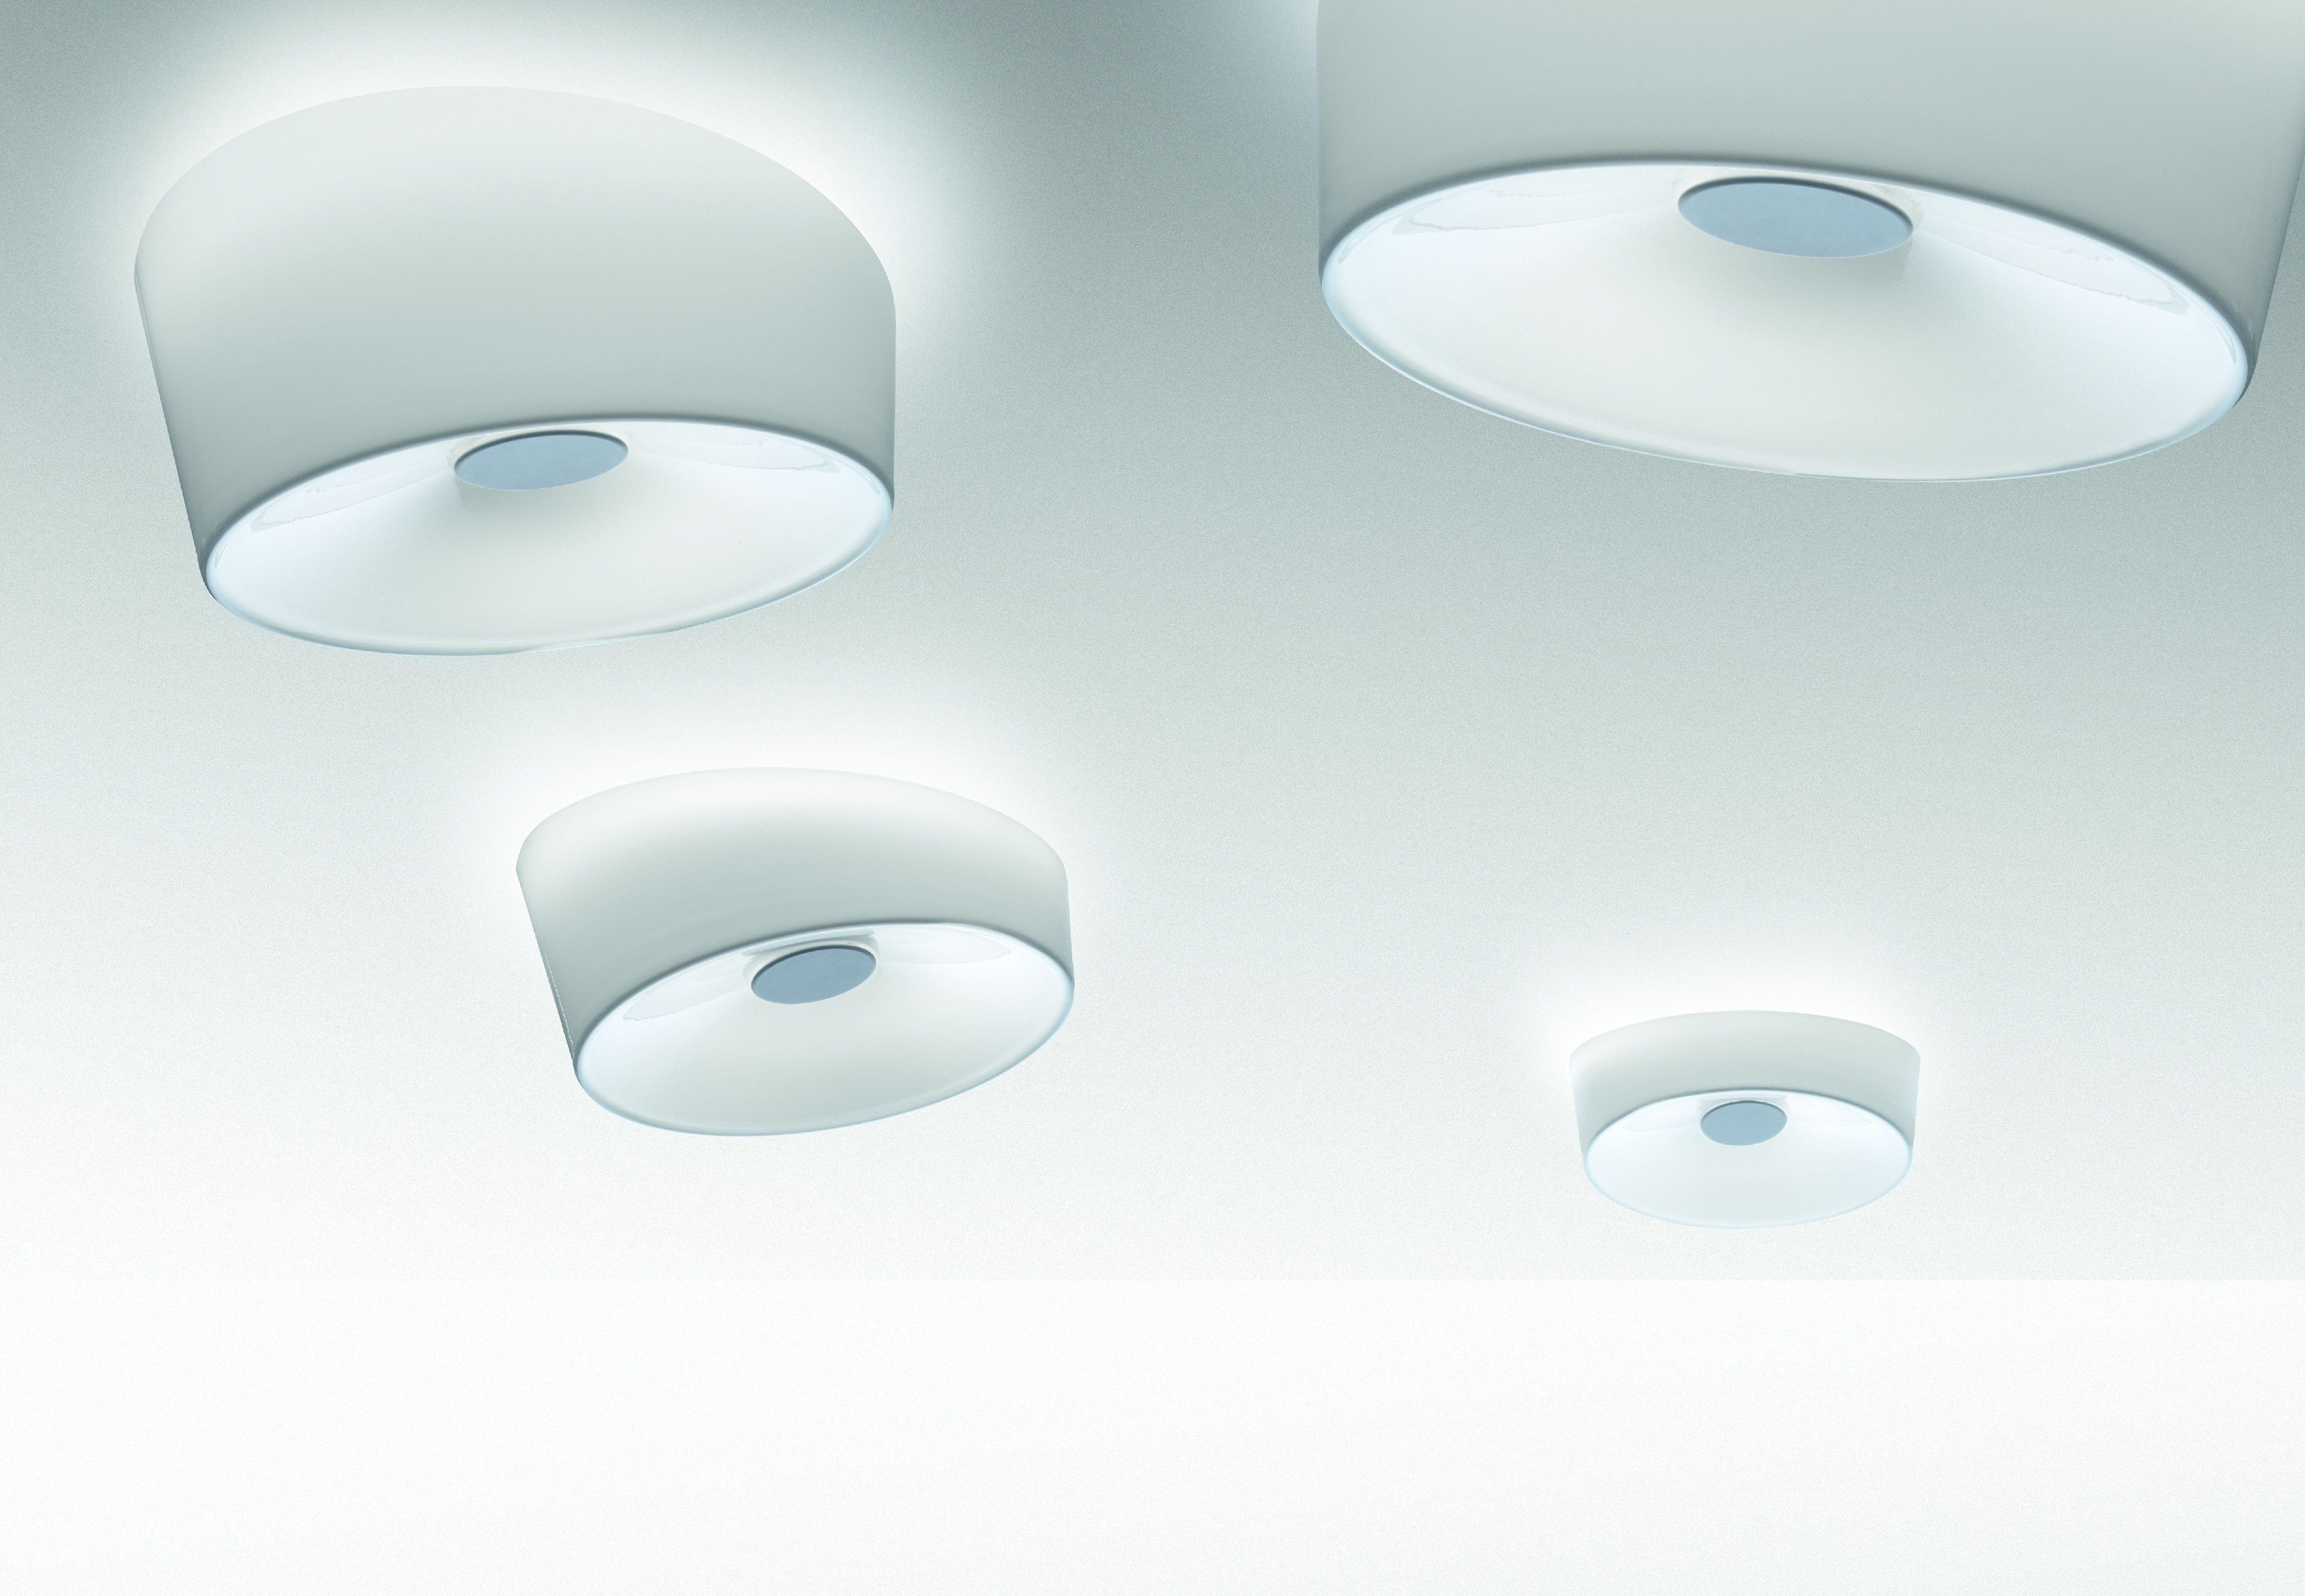 Plafoniera Foscarini : Scopri plafoniera lumiere xxl bianco di